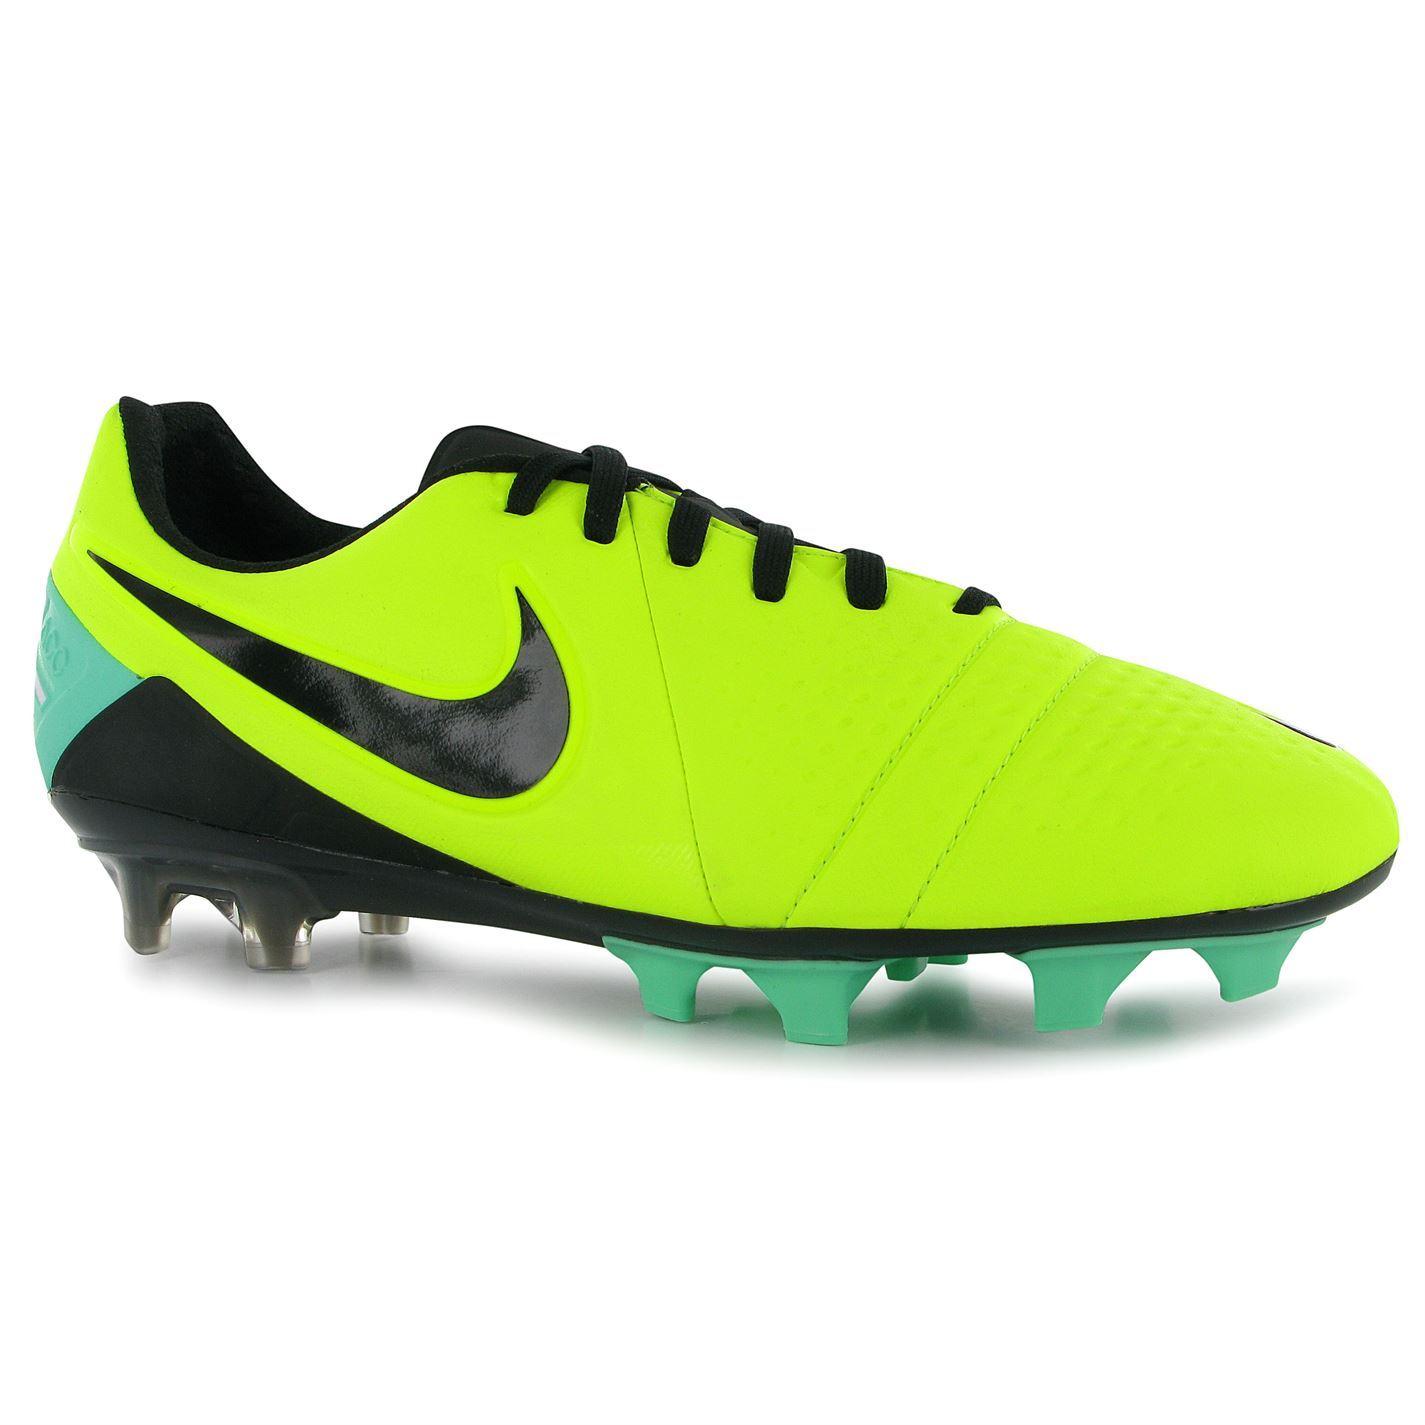 nike ctr360 maestri iii firm ground mens football boots